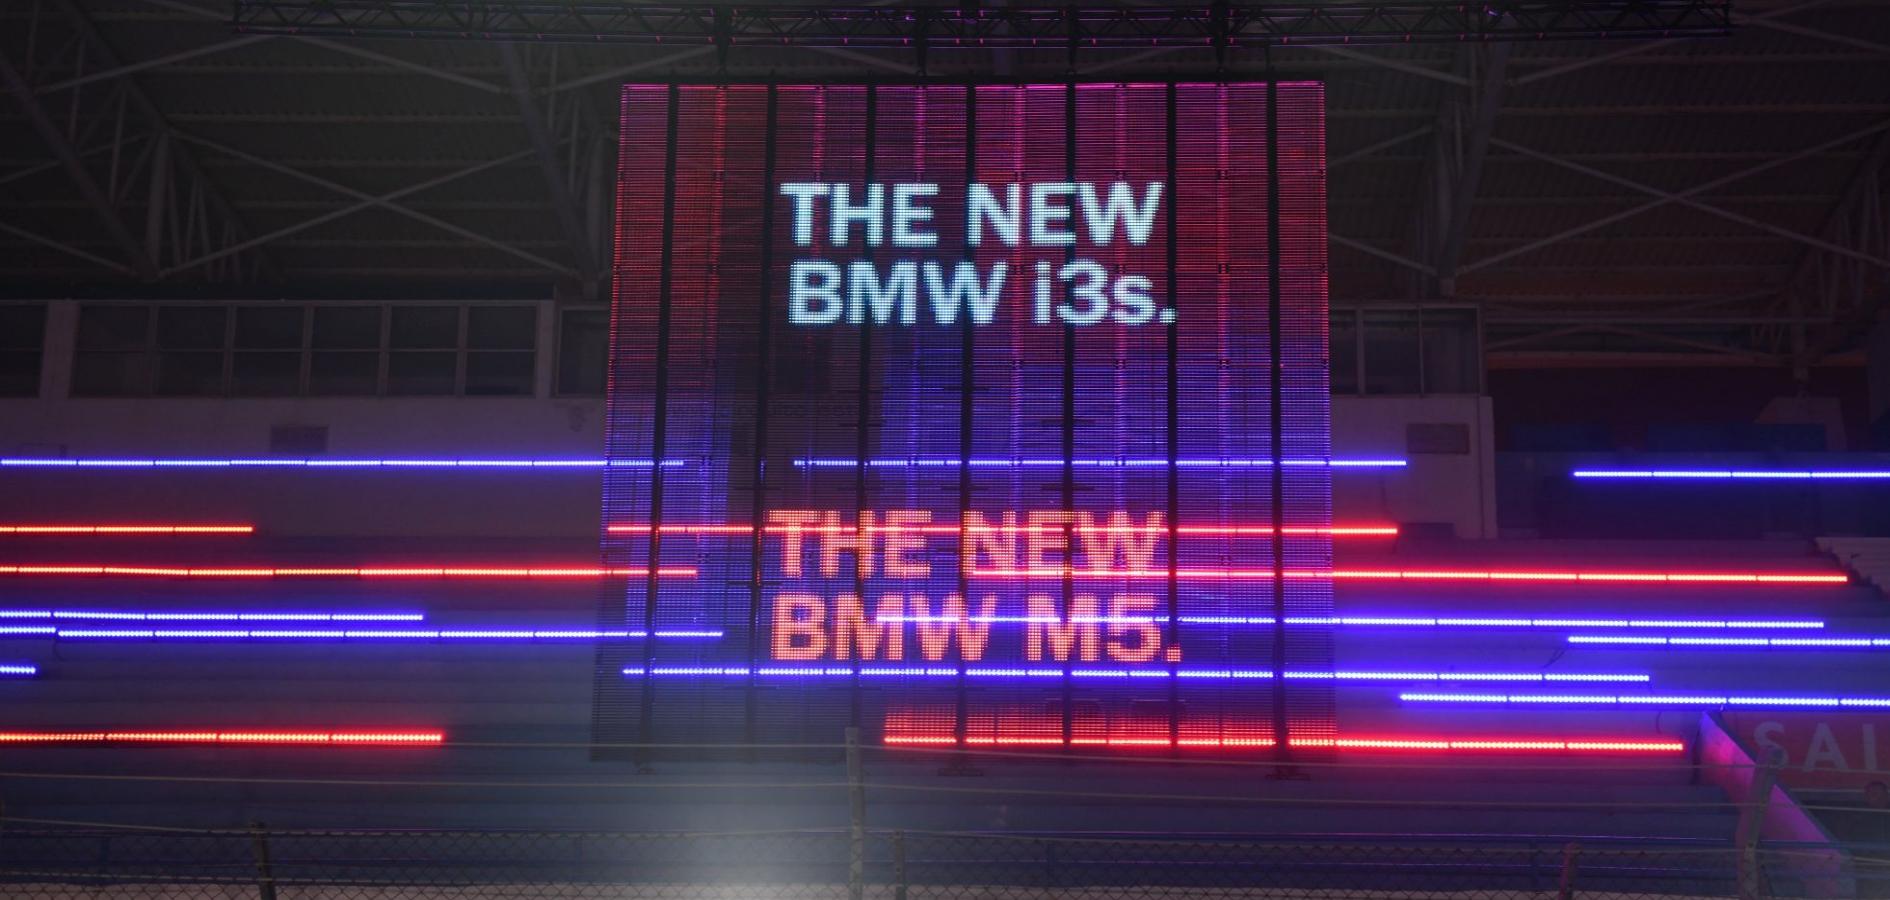 BMW M5 & BMW i3s, Lissabon, Portugal